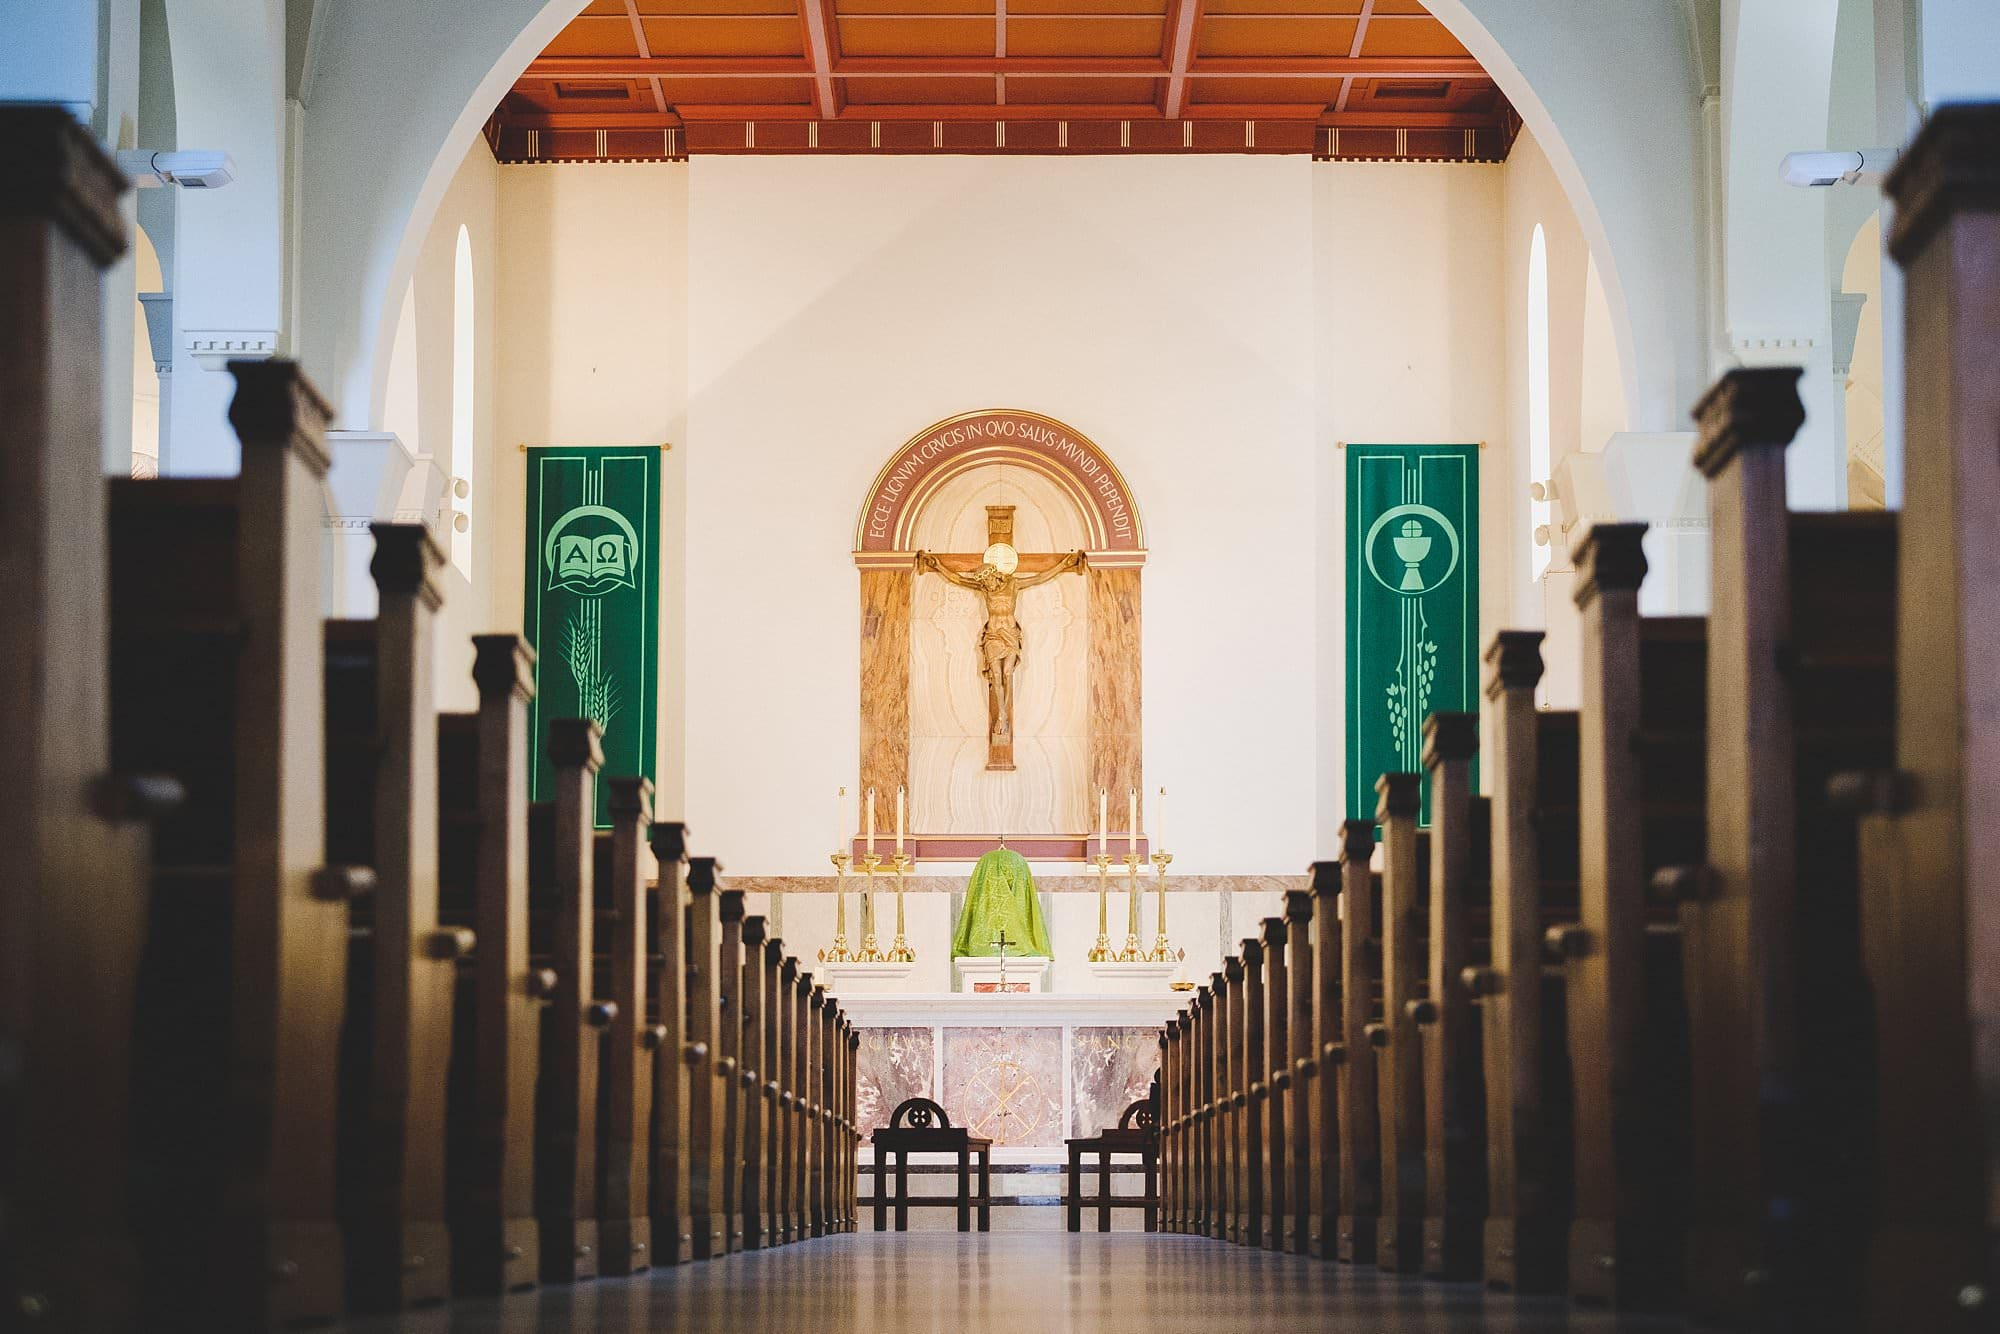 holy cross rc church parsons green wedding photographer 004 - For Couples | Holy Cross Church Wedding Photographer